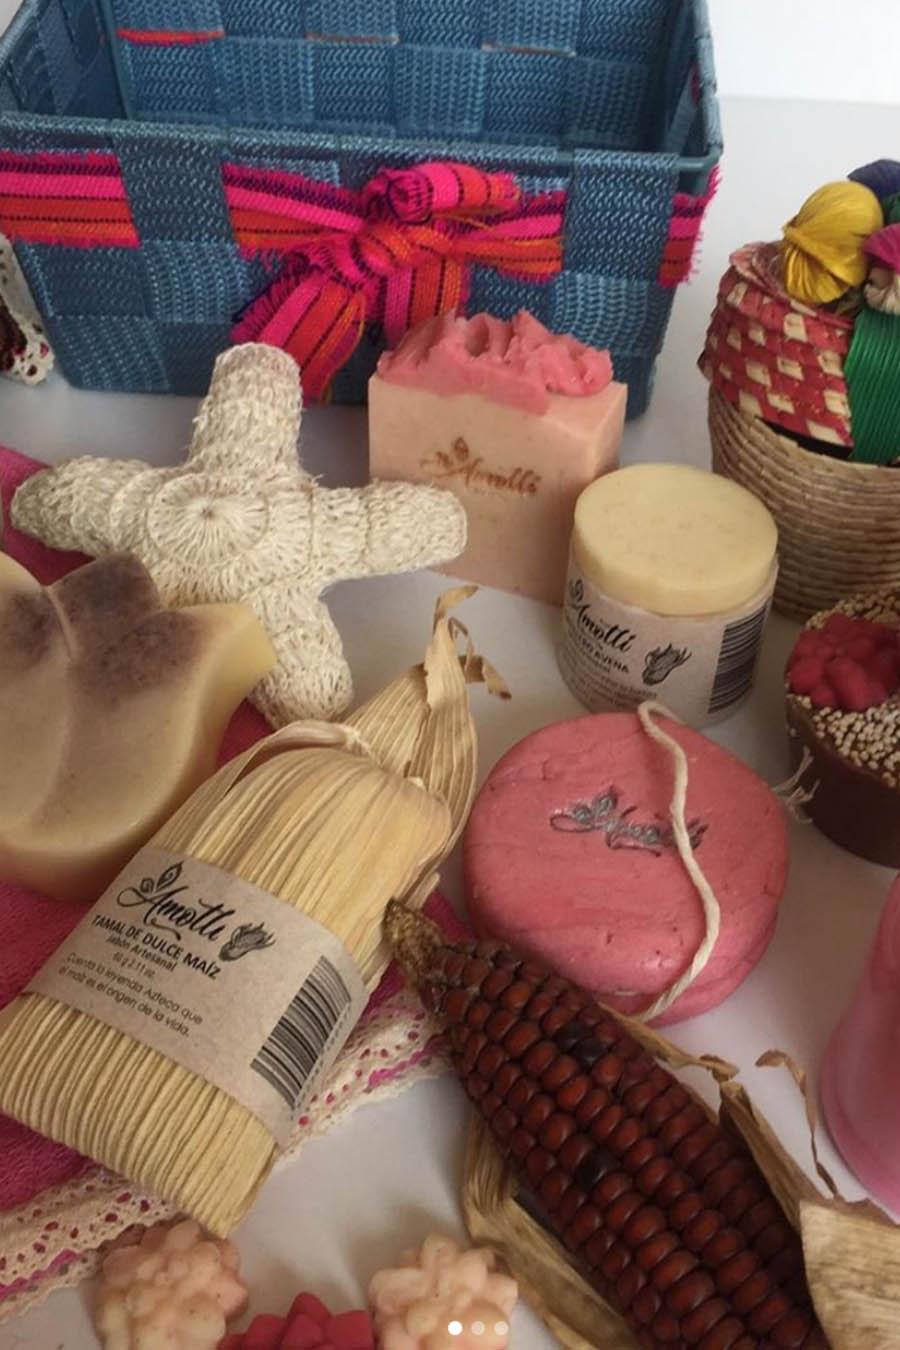 cosmetica natural jabones artesanales jabones de maiz izamaiz